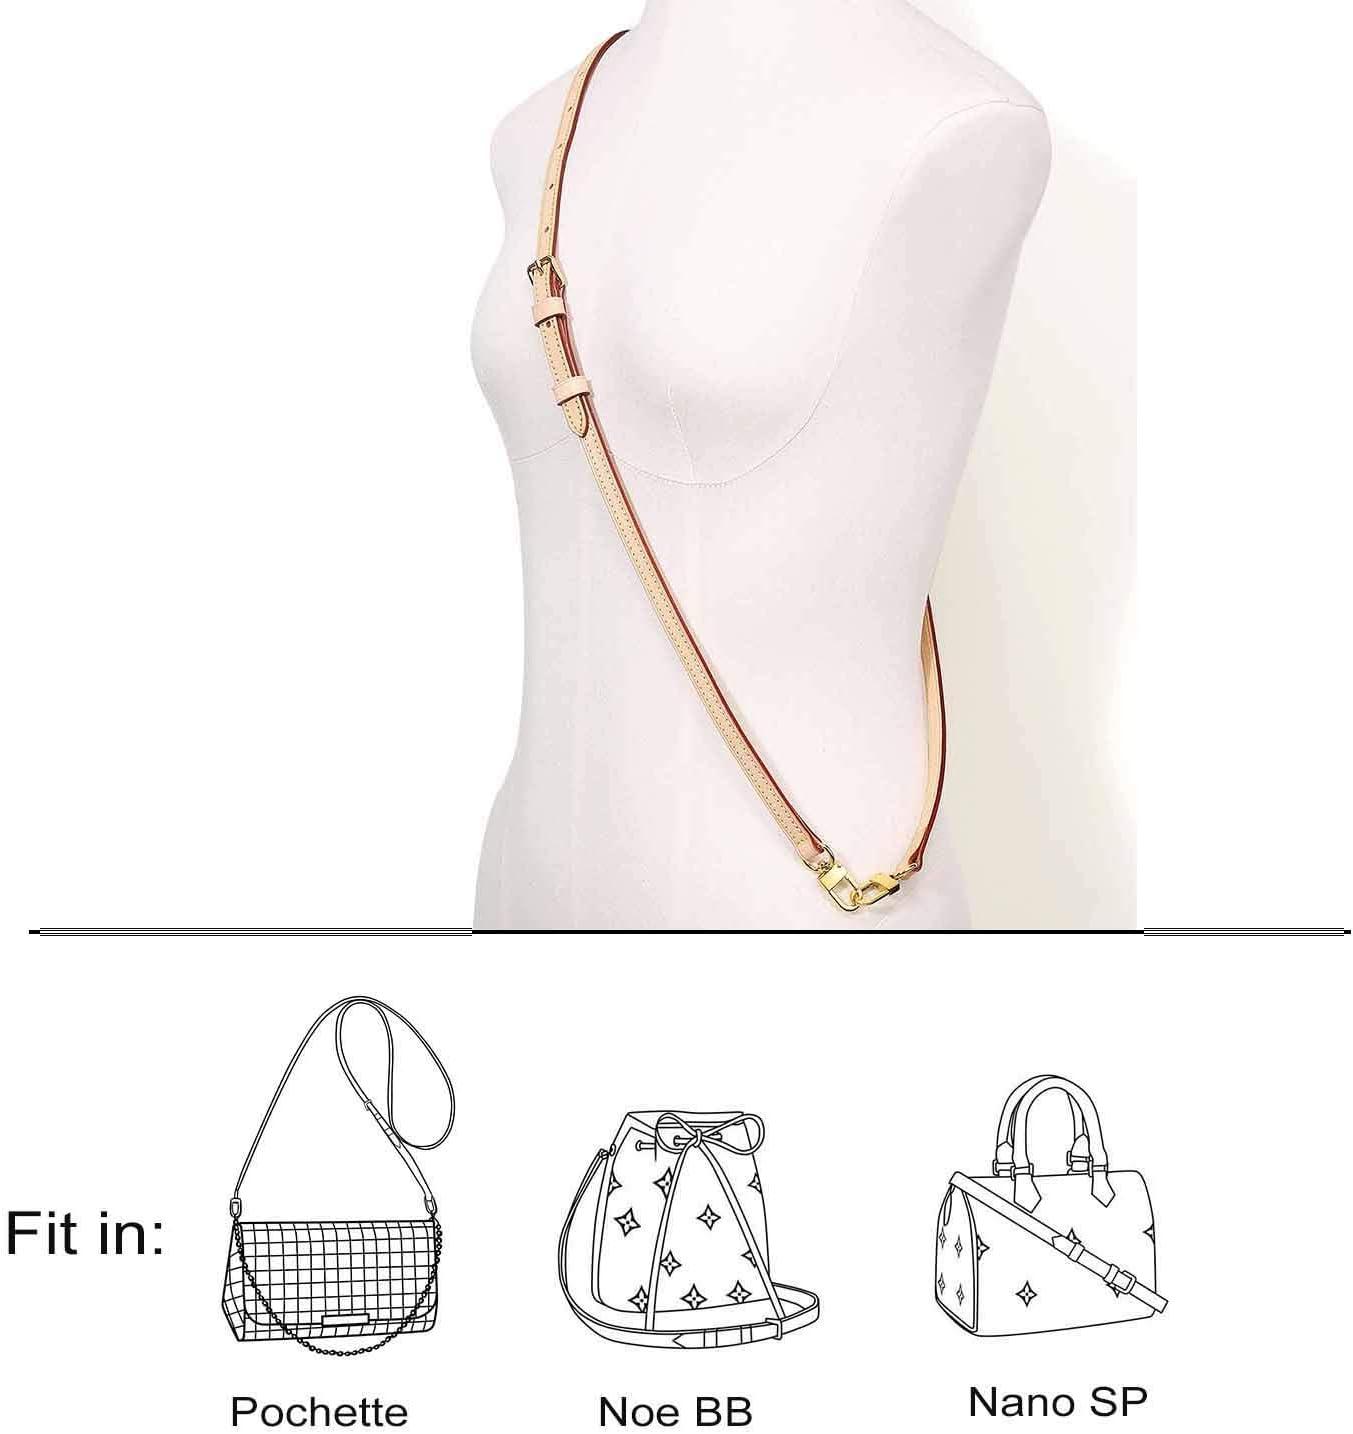 Cross Body Strap for Small Bag Alma Pochette Eva Favorite PM MM Messenger Bag Coated Black with Gold Hardware Black 43 inch Gold HW